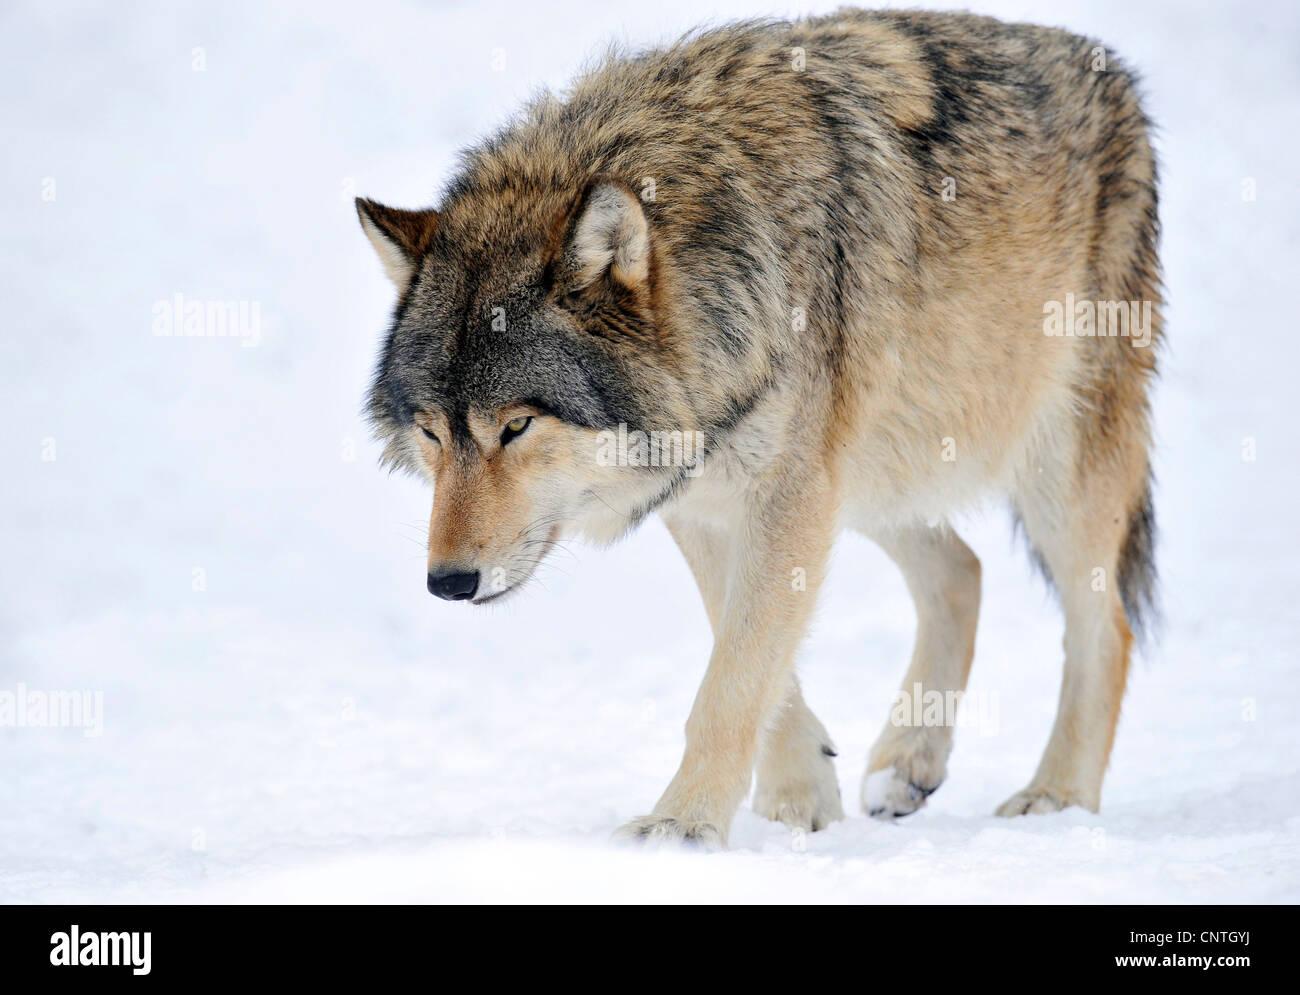 Mackenzie valley wolf - photo#14